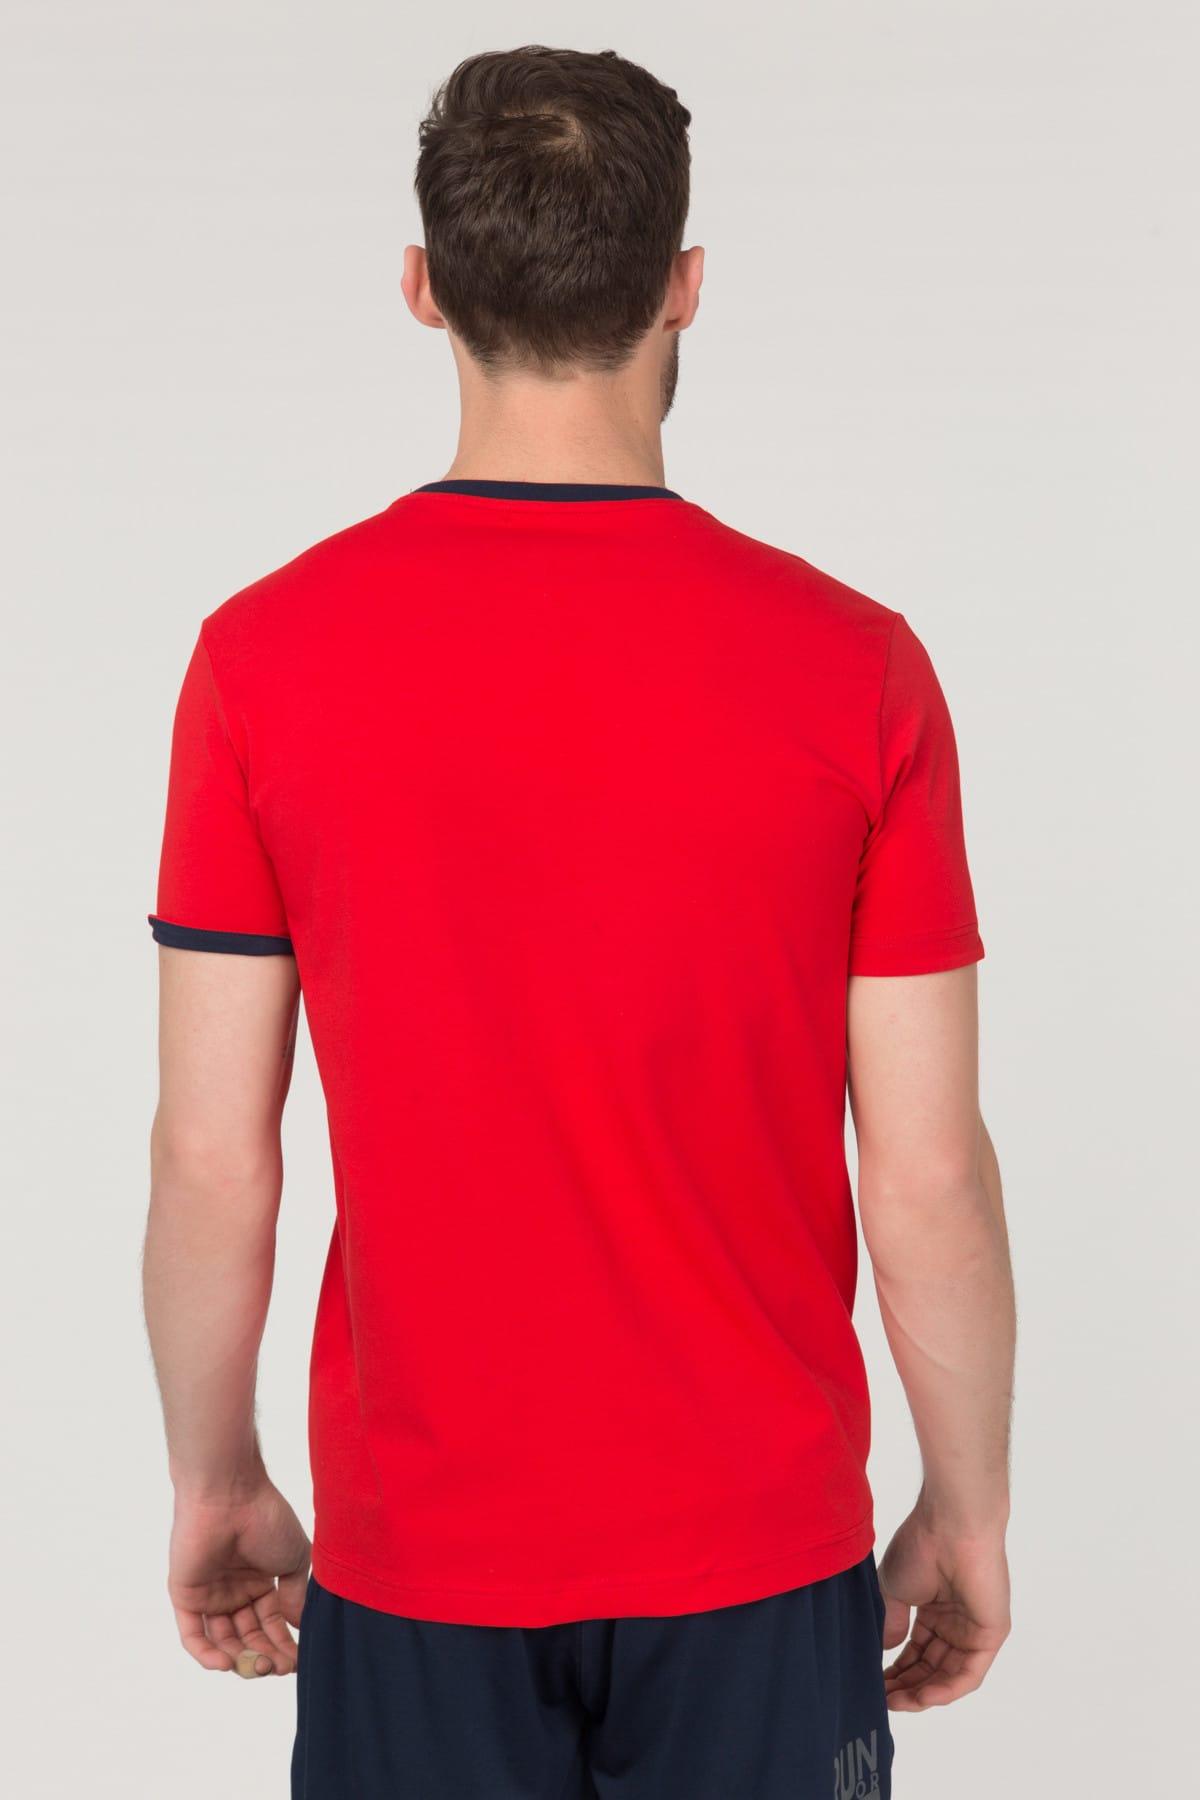 bilcee Kırmızı Pamuklu Erkek T-Shirt FS-1630 2